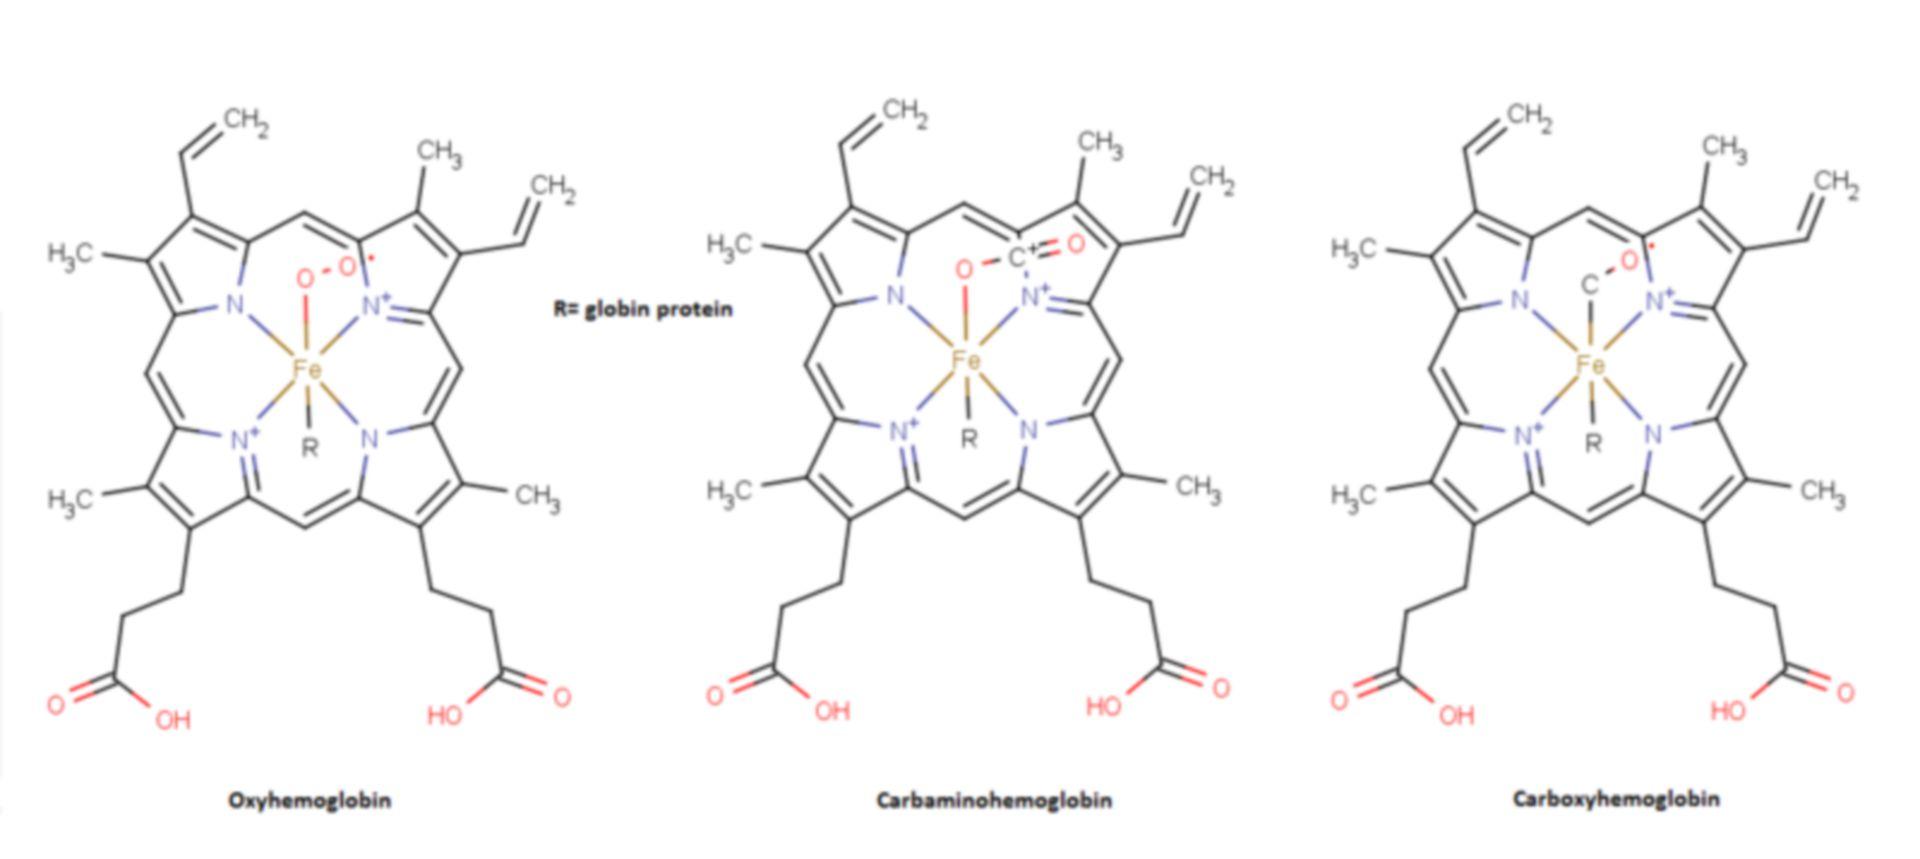 Hemoglobin structures